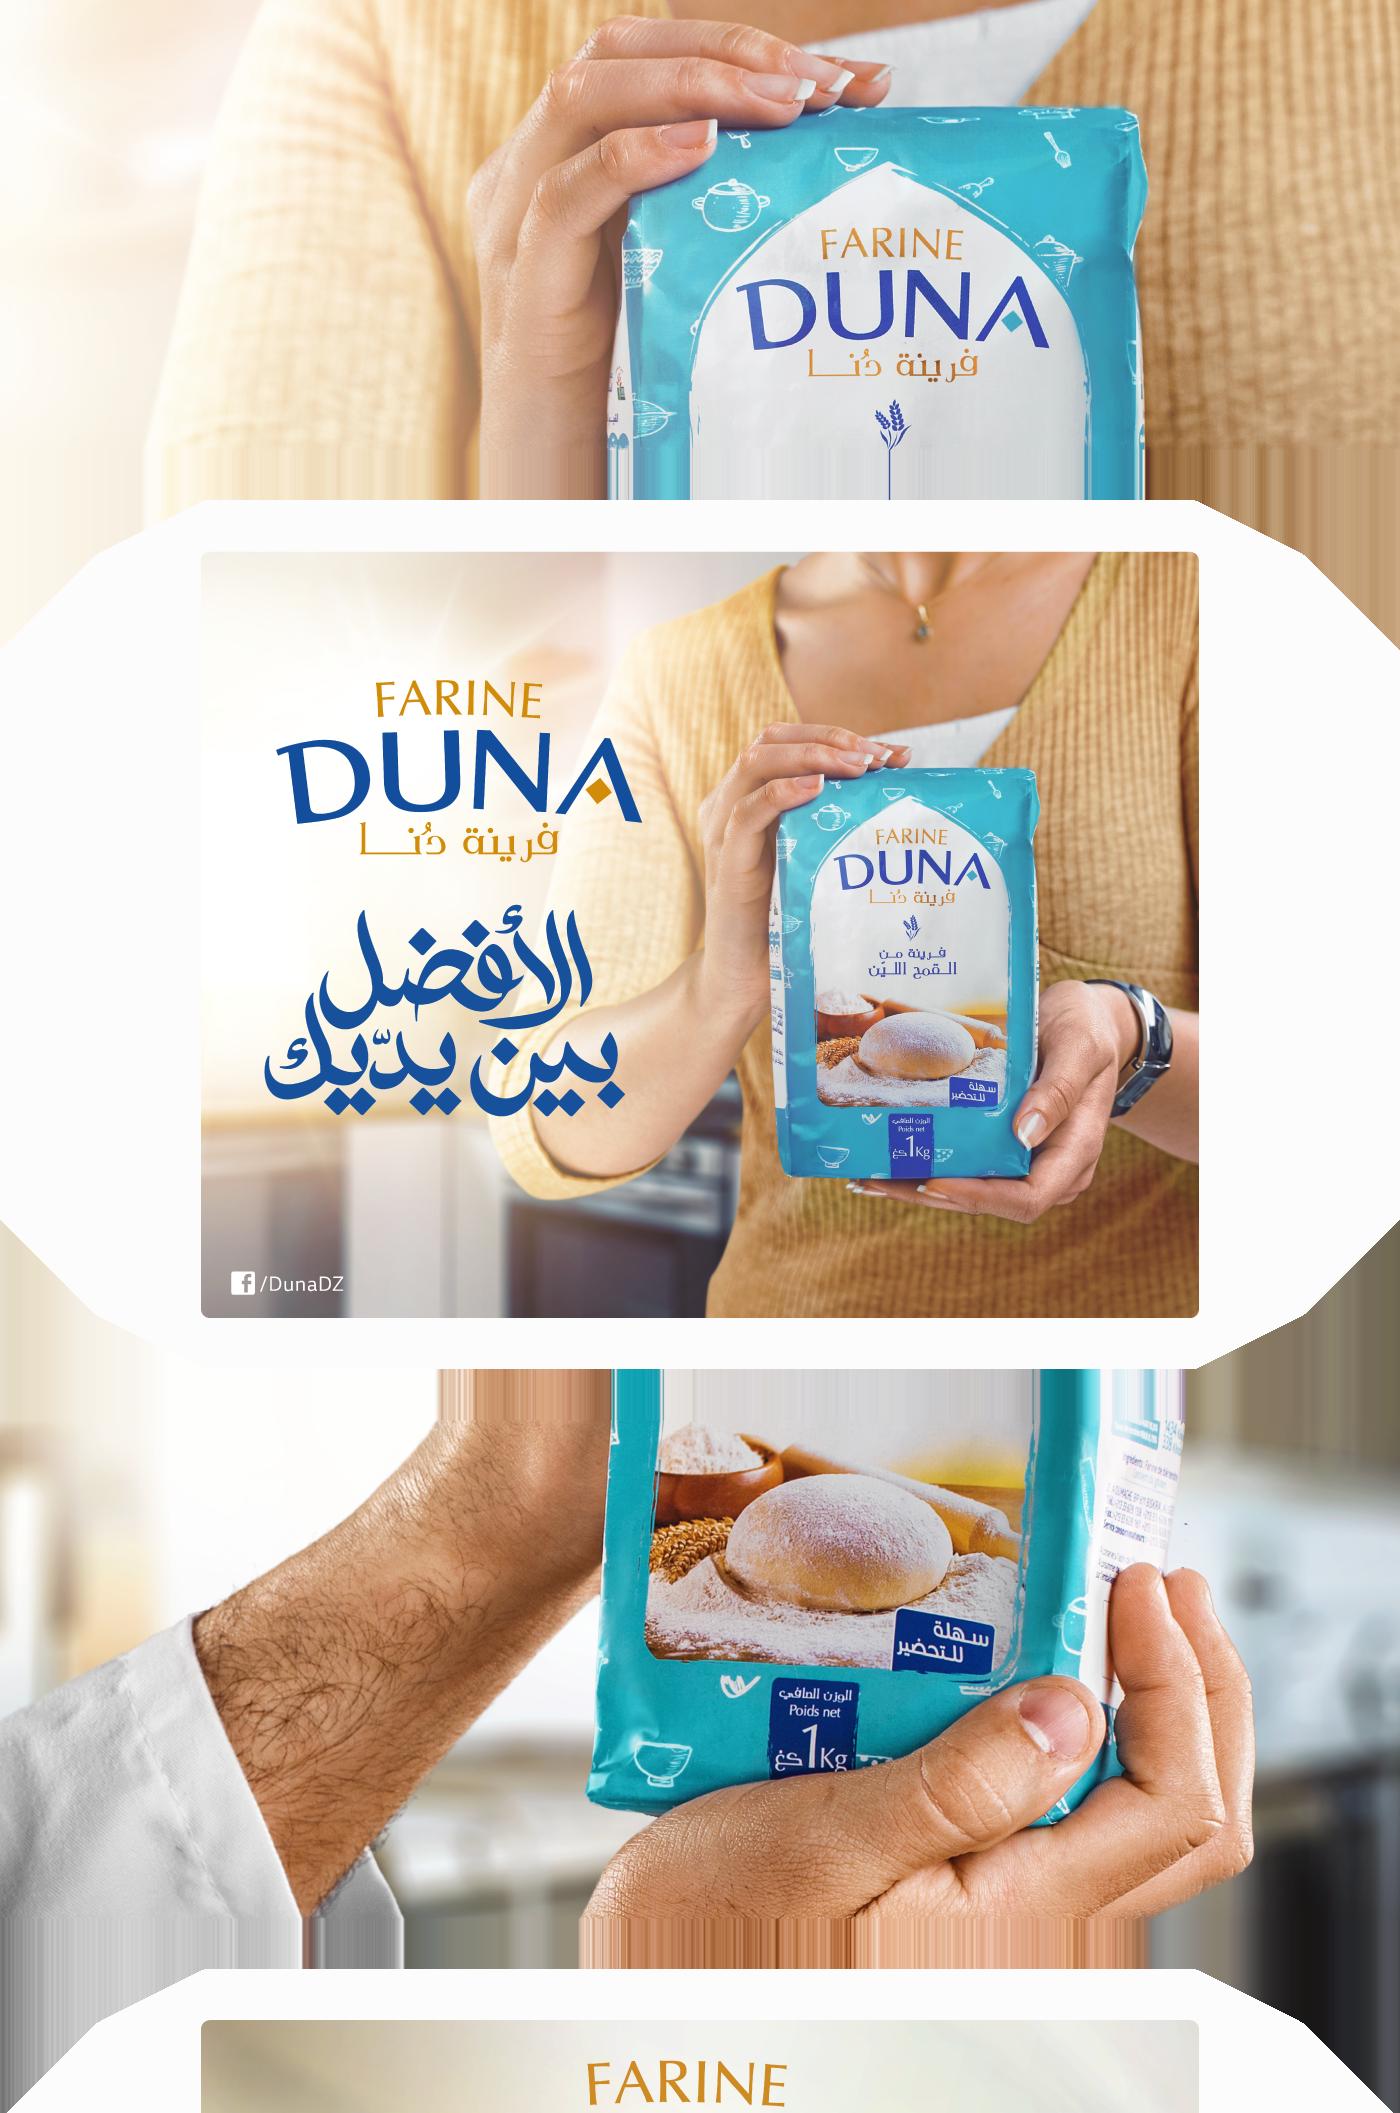 Duna,farine,flour,Algeria,algiers,الأفظل بين يديك,Quality,cook,kitchen,pastry